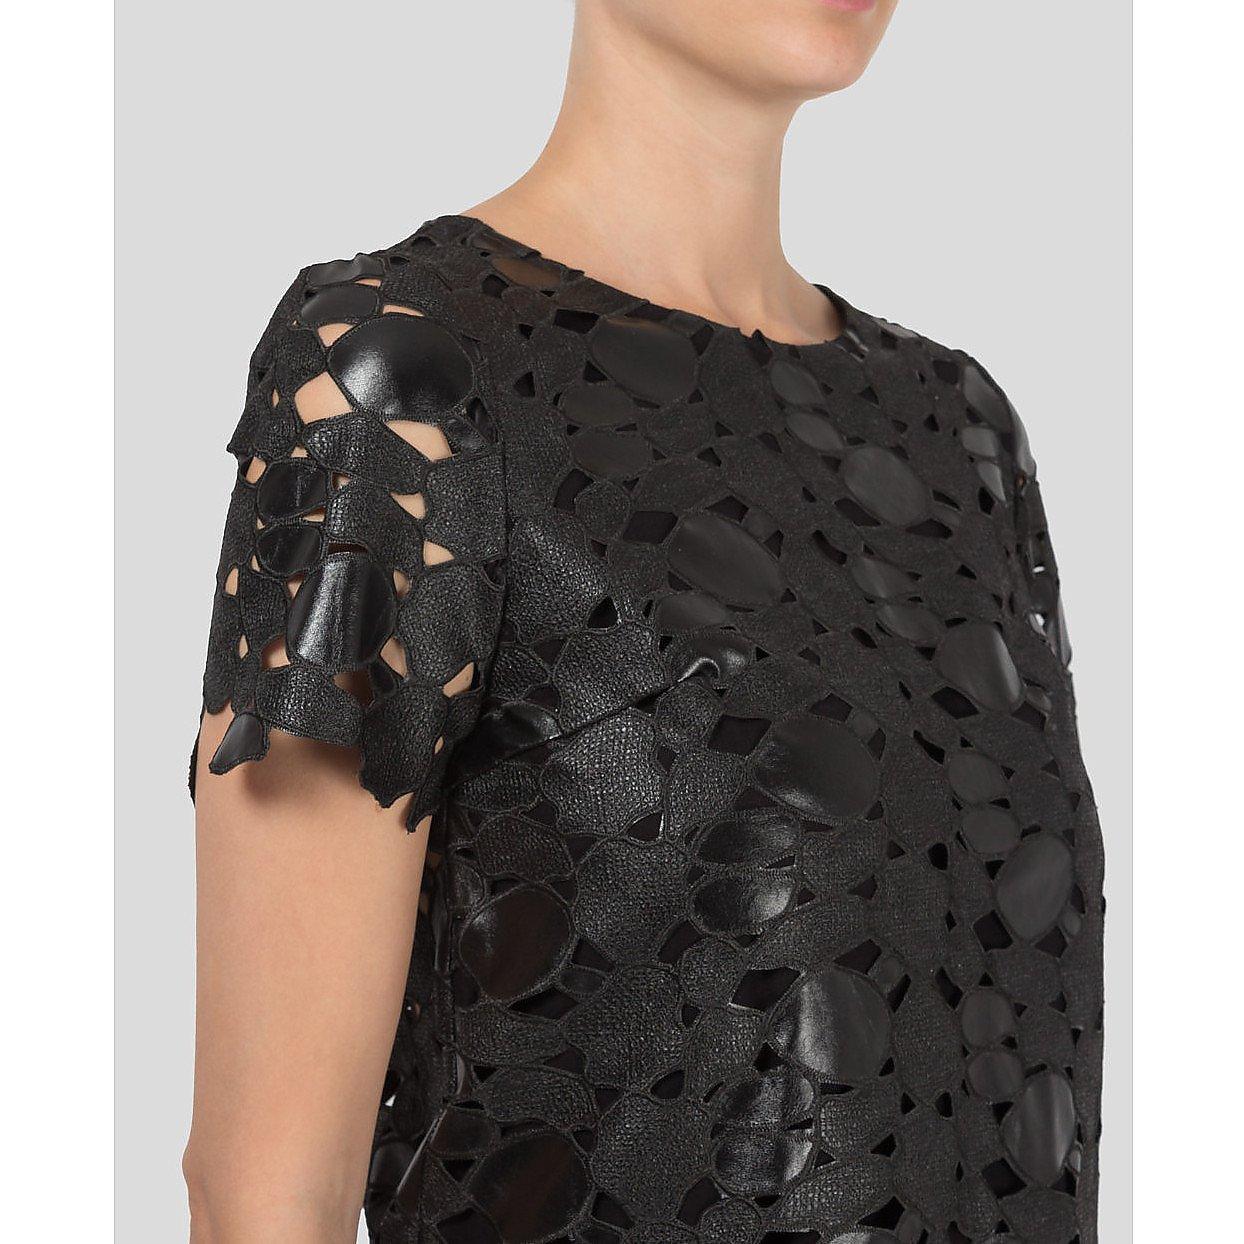 Zoe Jordan Laser Cut Leather Top